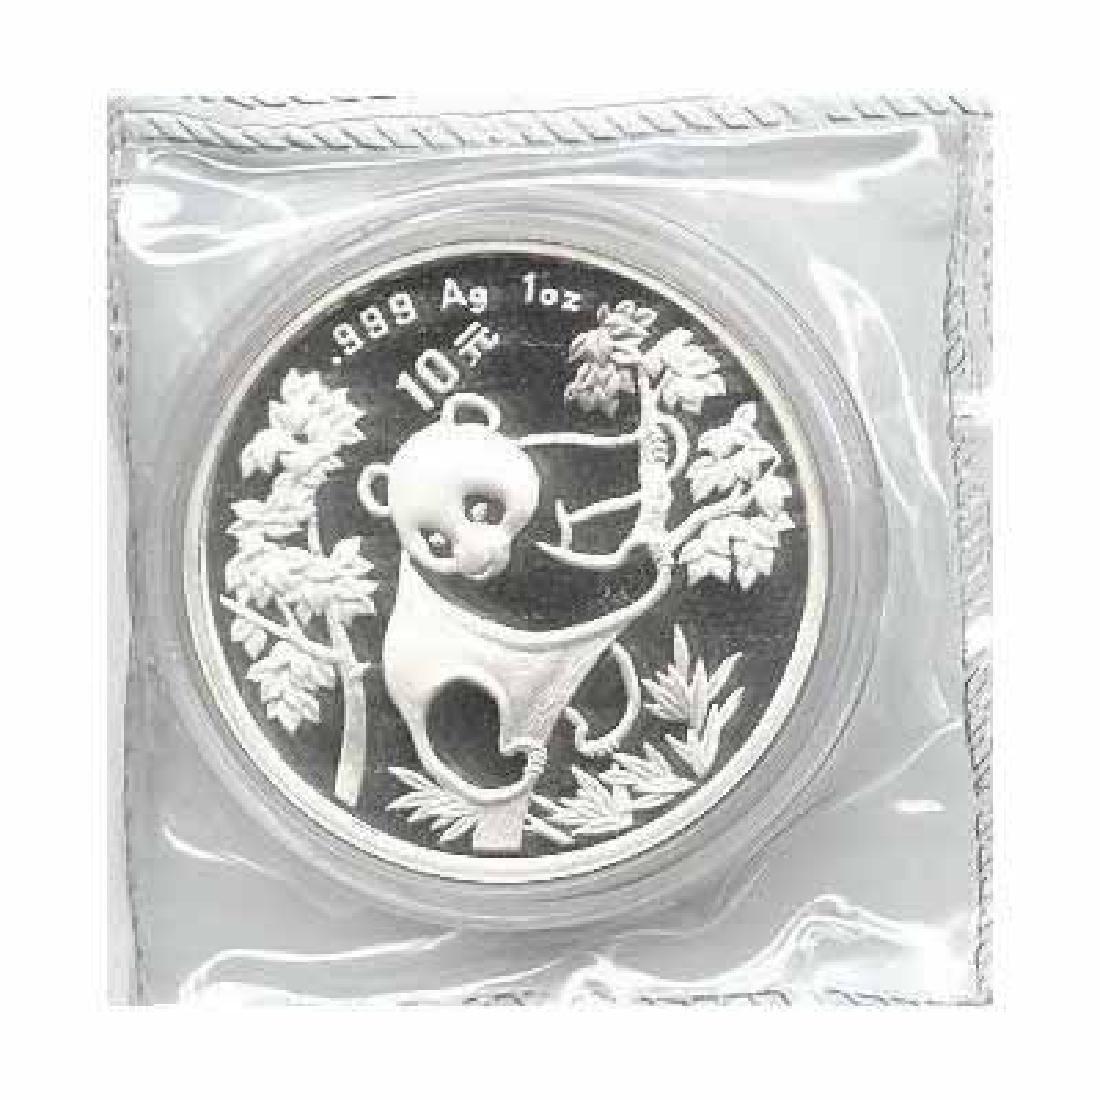 1992 Chinese Silver Panda 1 oz - Large Date